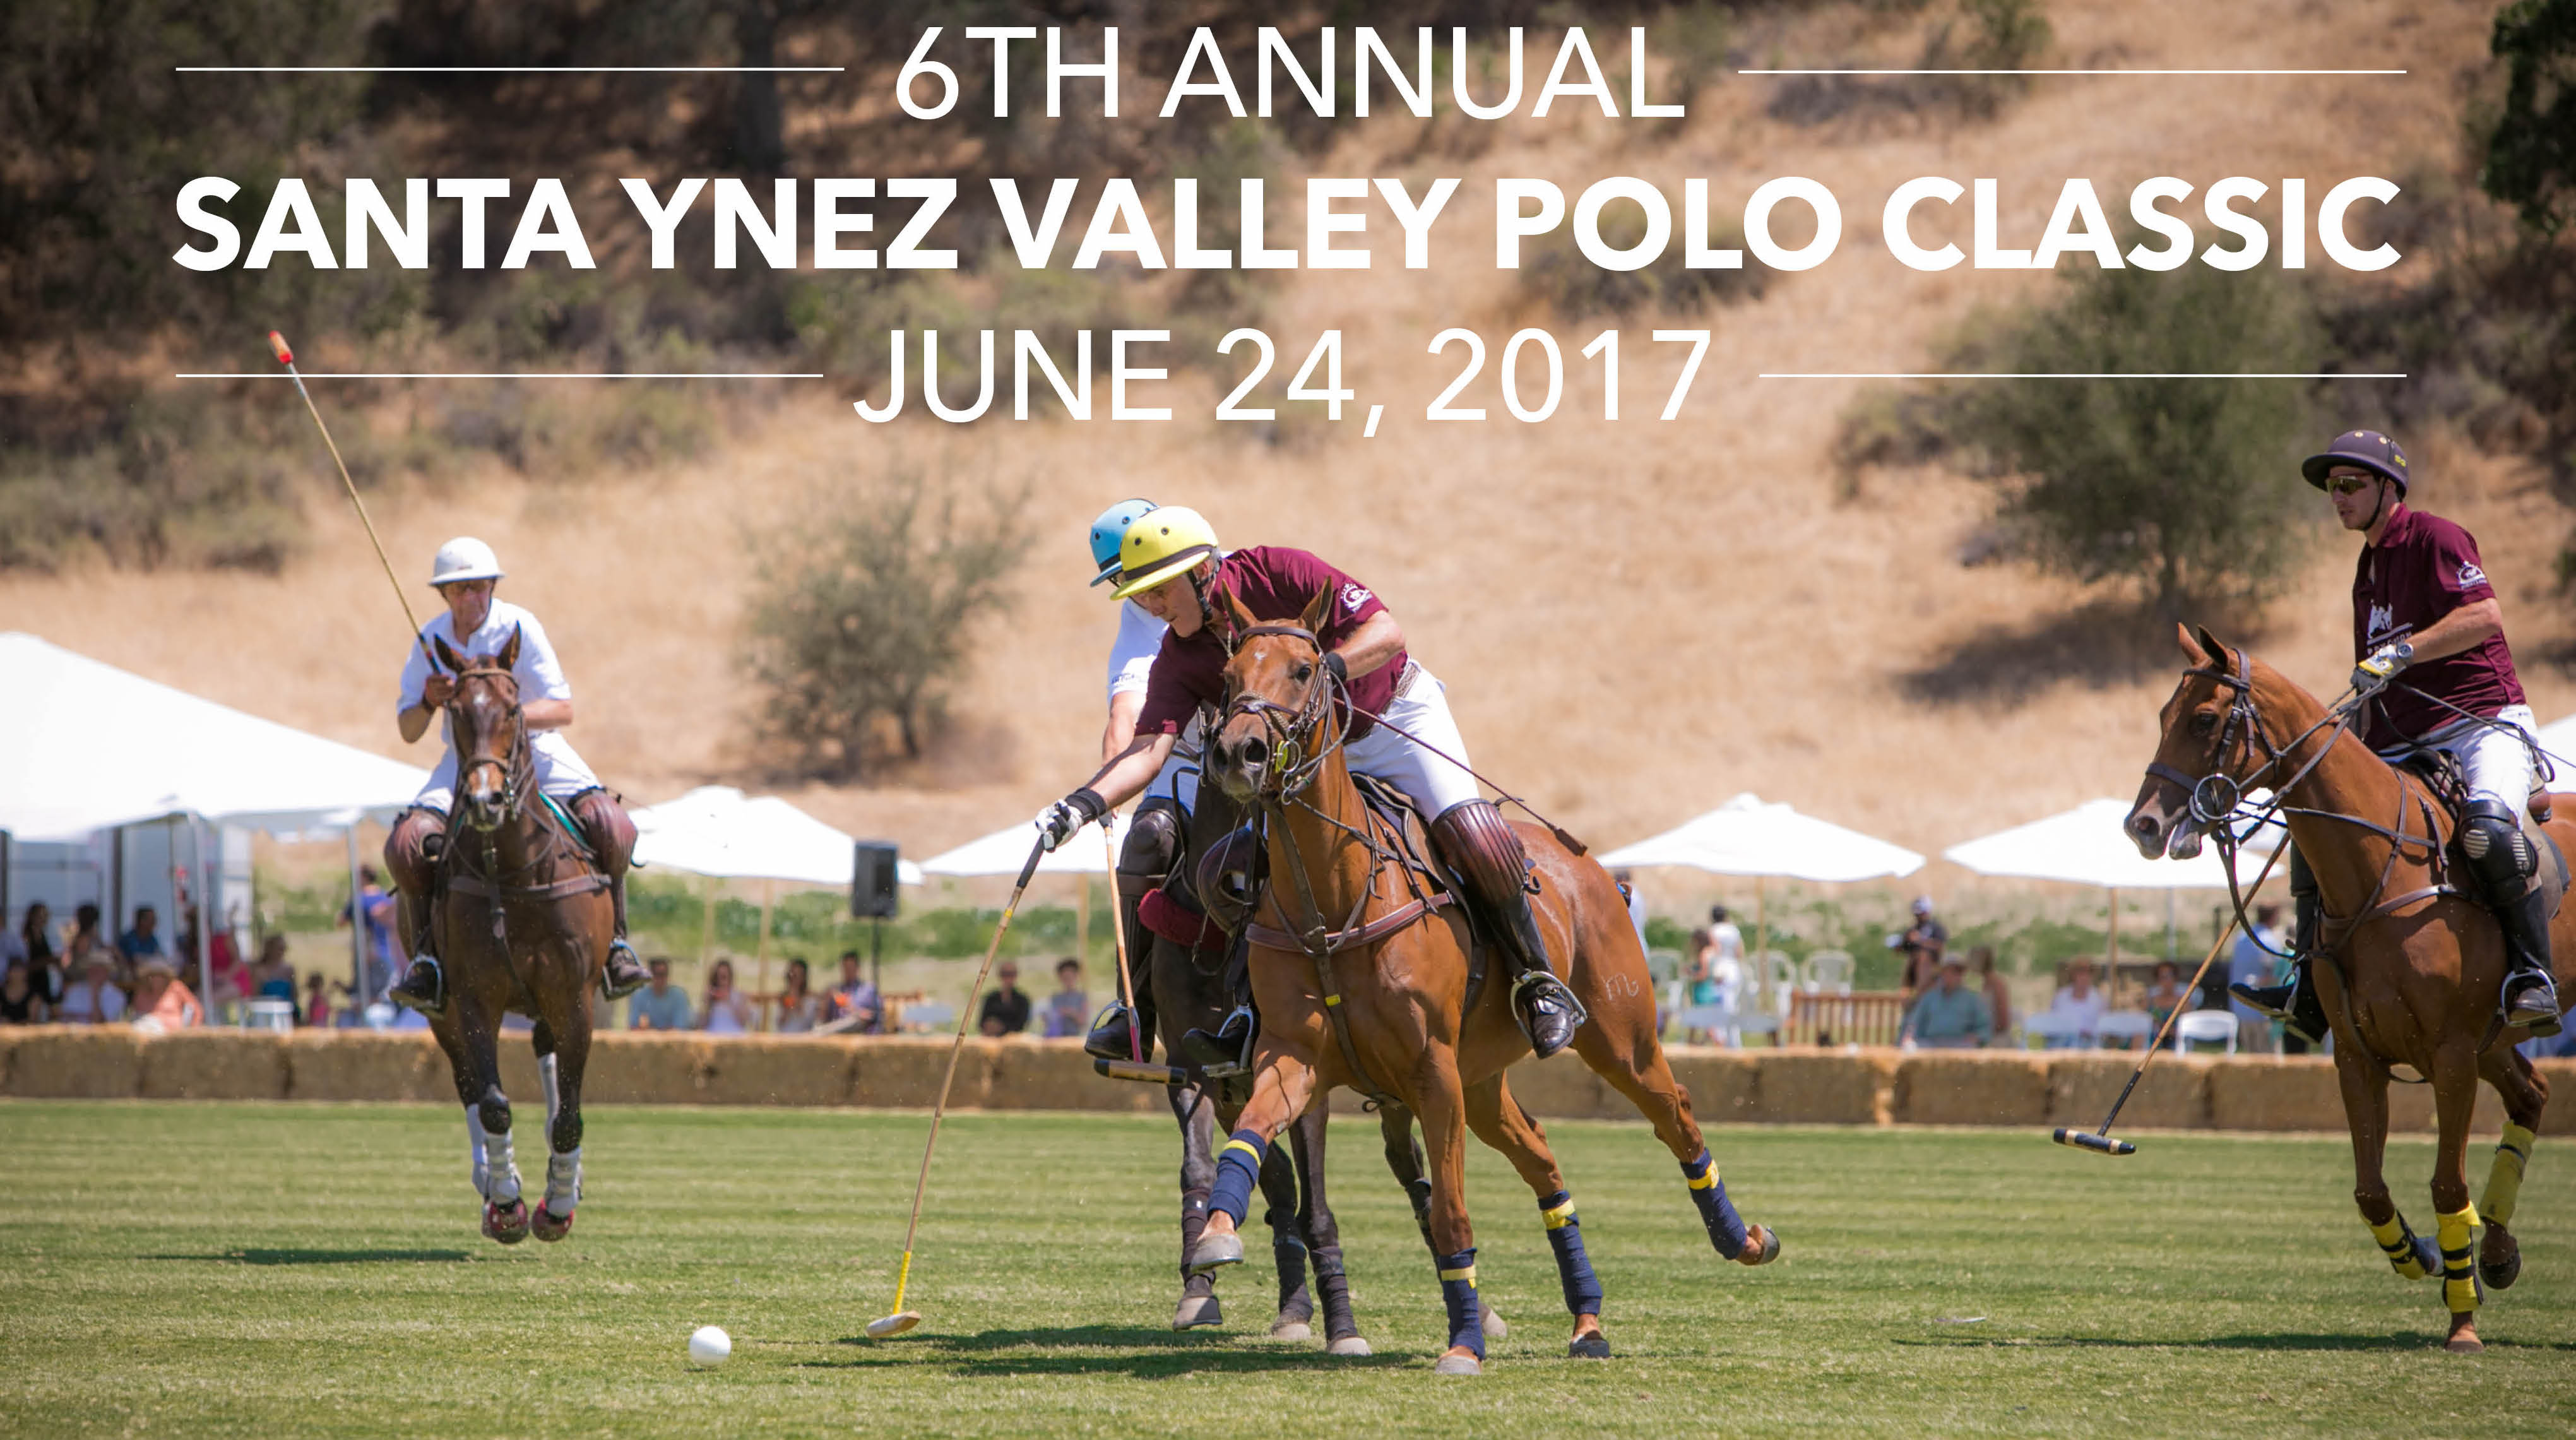 6th Annual Polo Classic